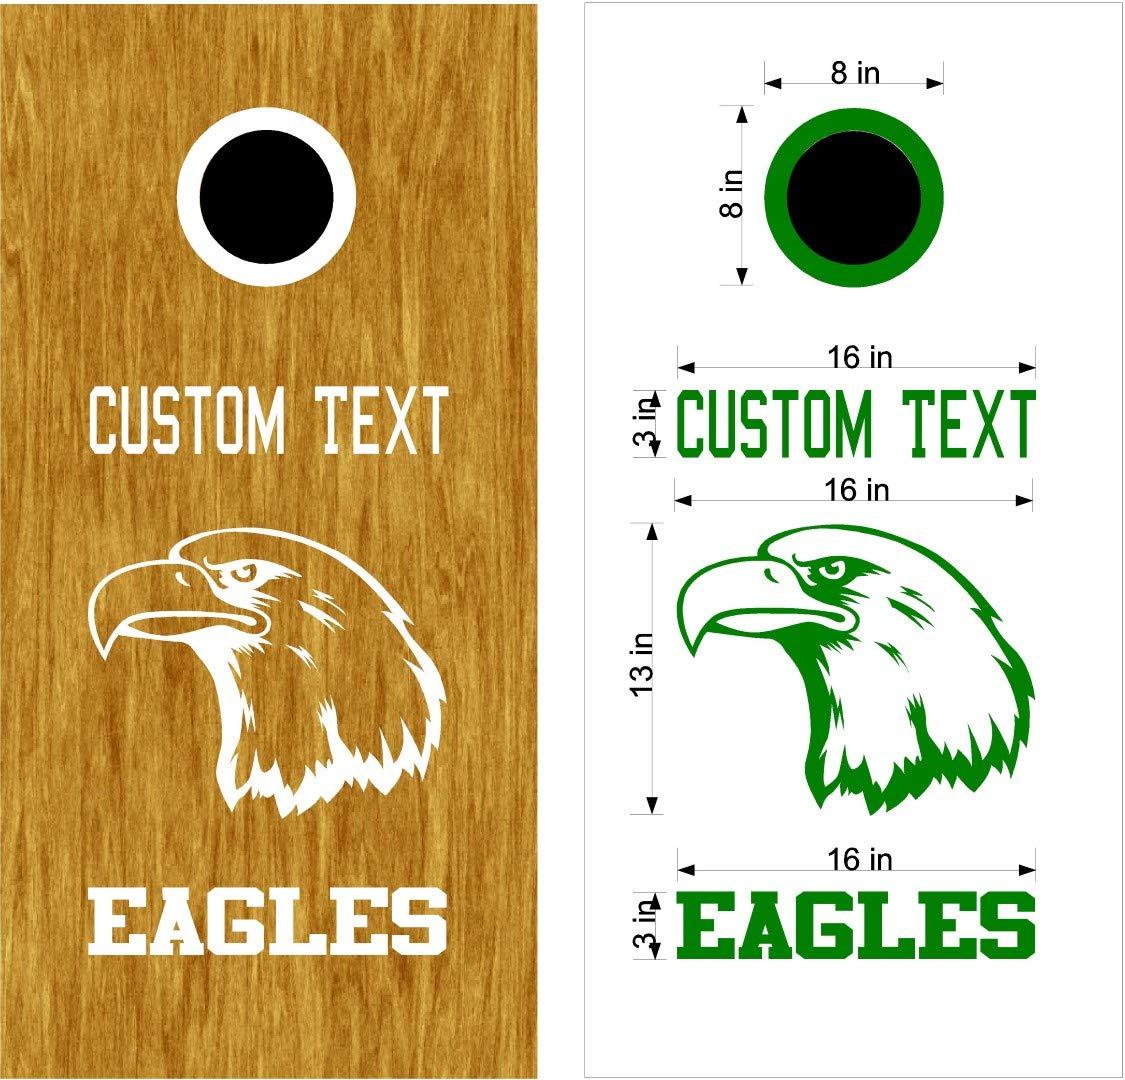 Eagles Mascot スポーツチーム コーンホールボード デカールステッカー 両方のボードに十分な大きさ。 B07HNG4RZK